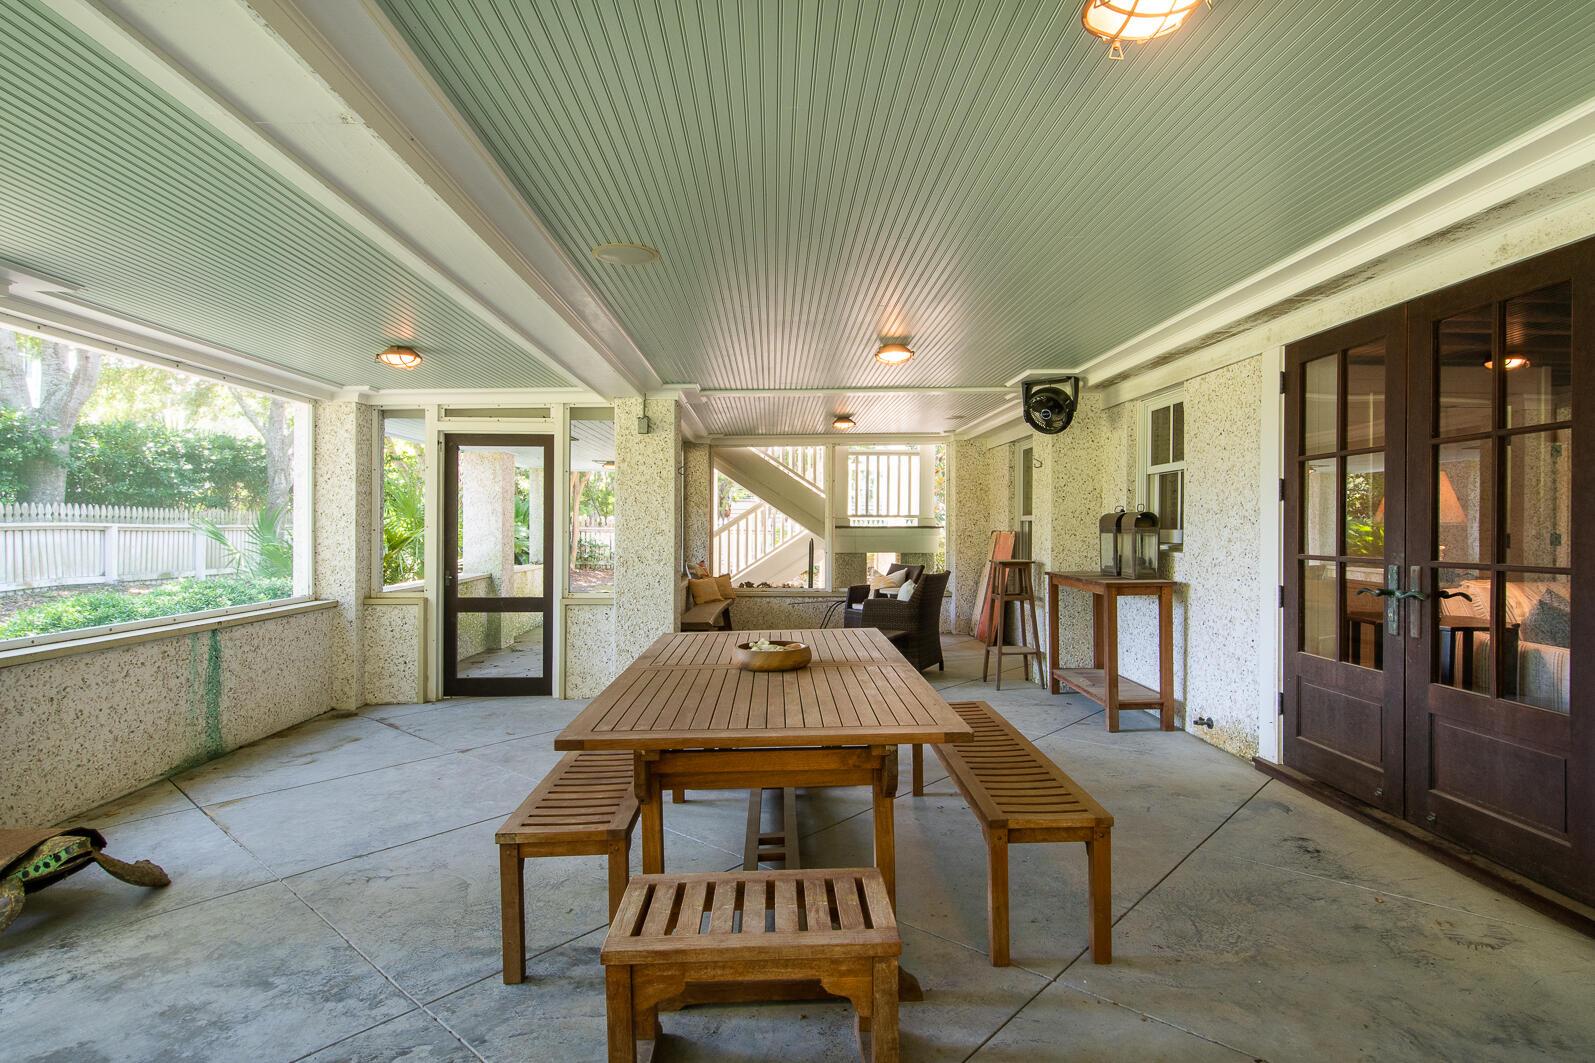 Sullivans Island Homes For Sale - 1773 Atlantic, Sullivans Island, SC - 15